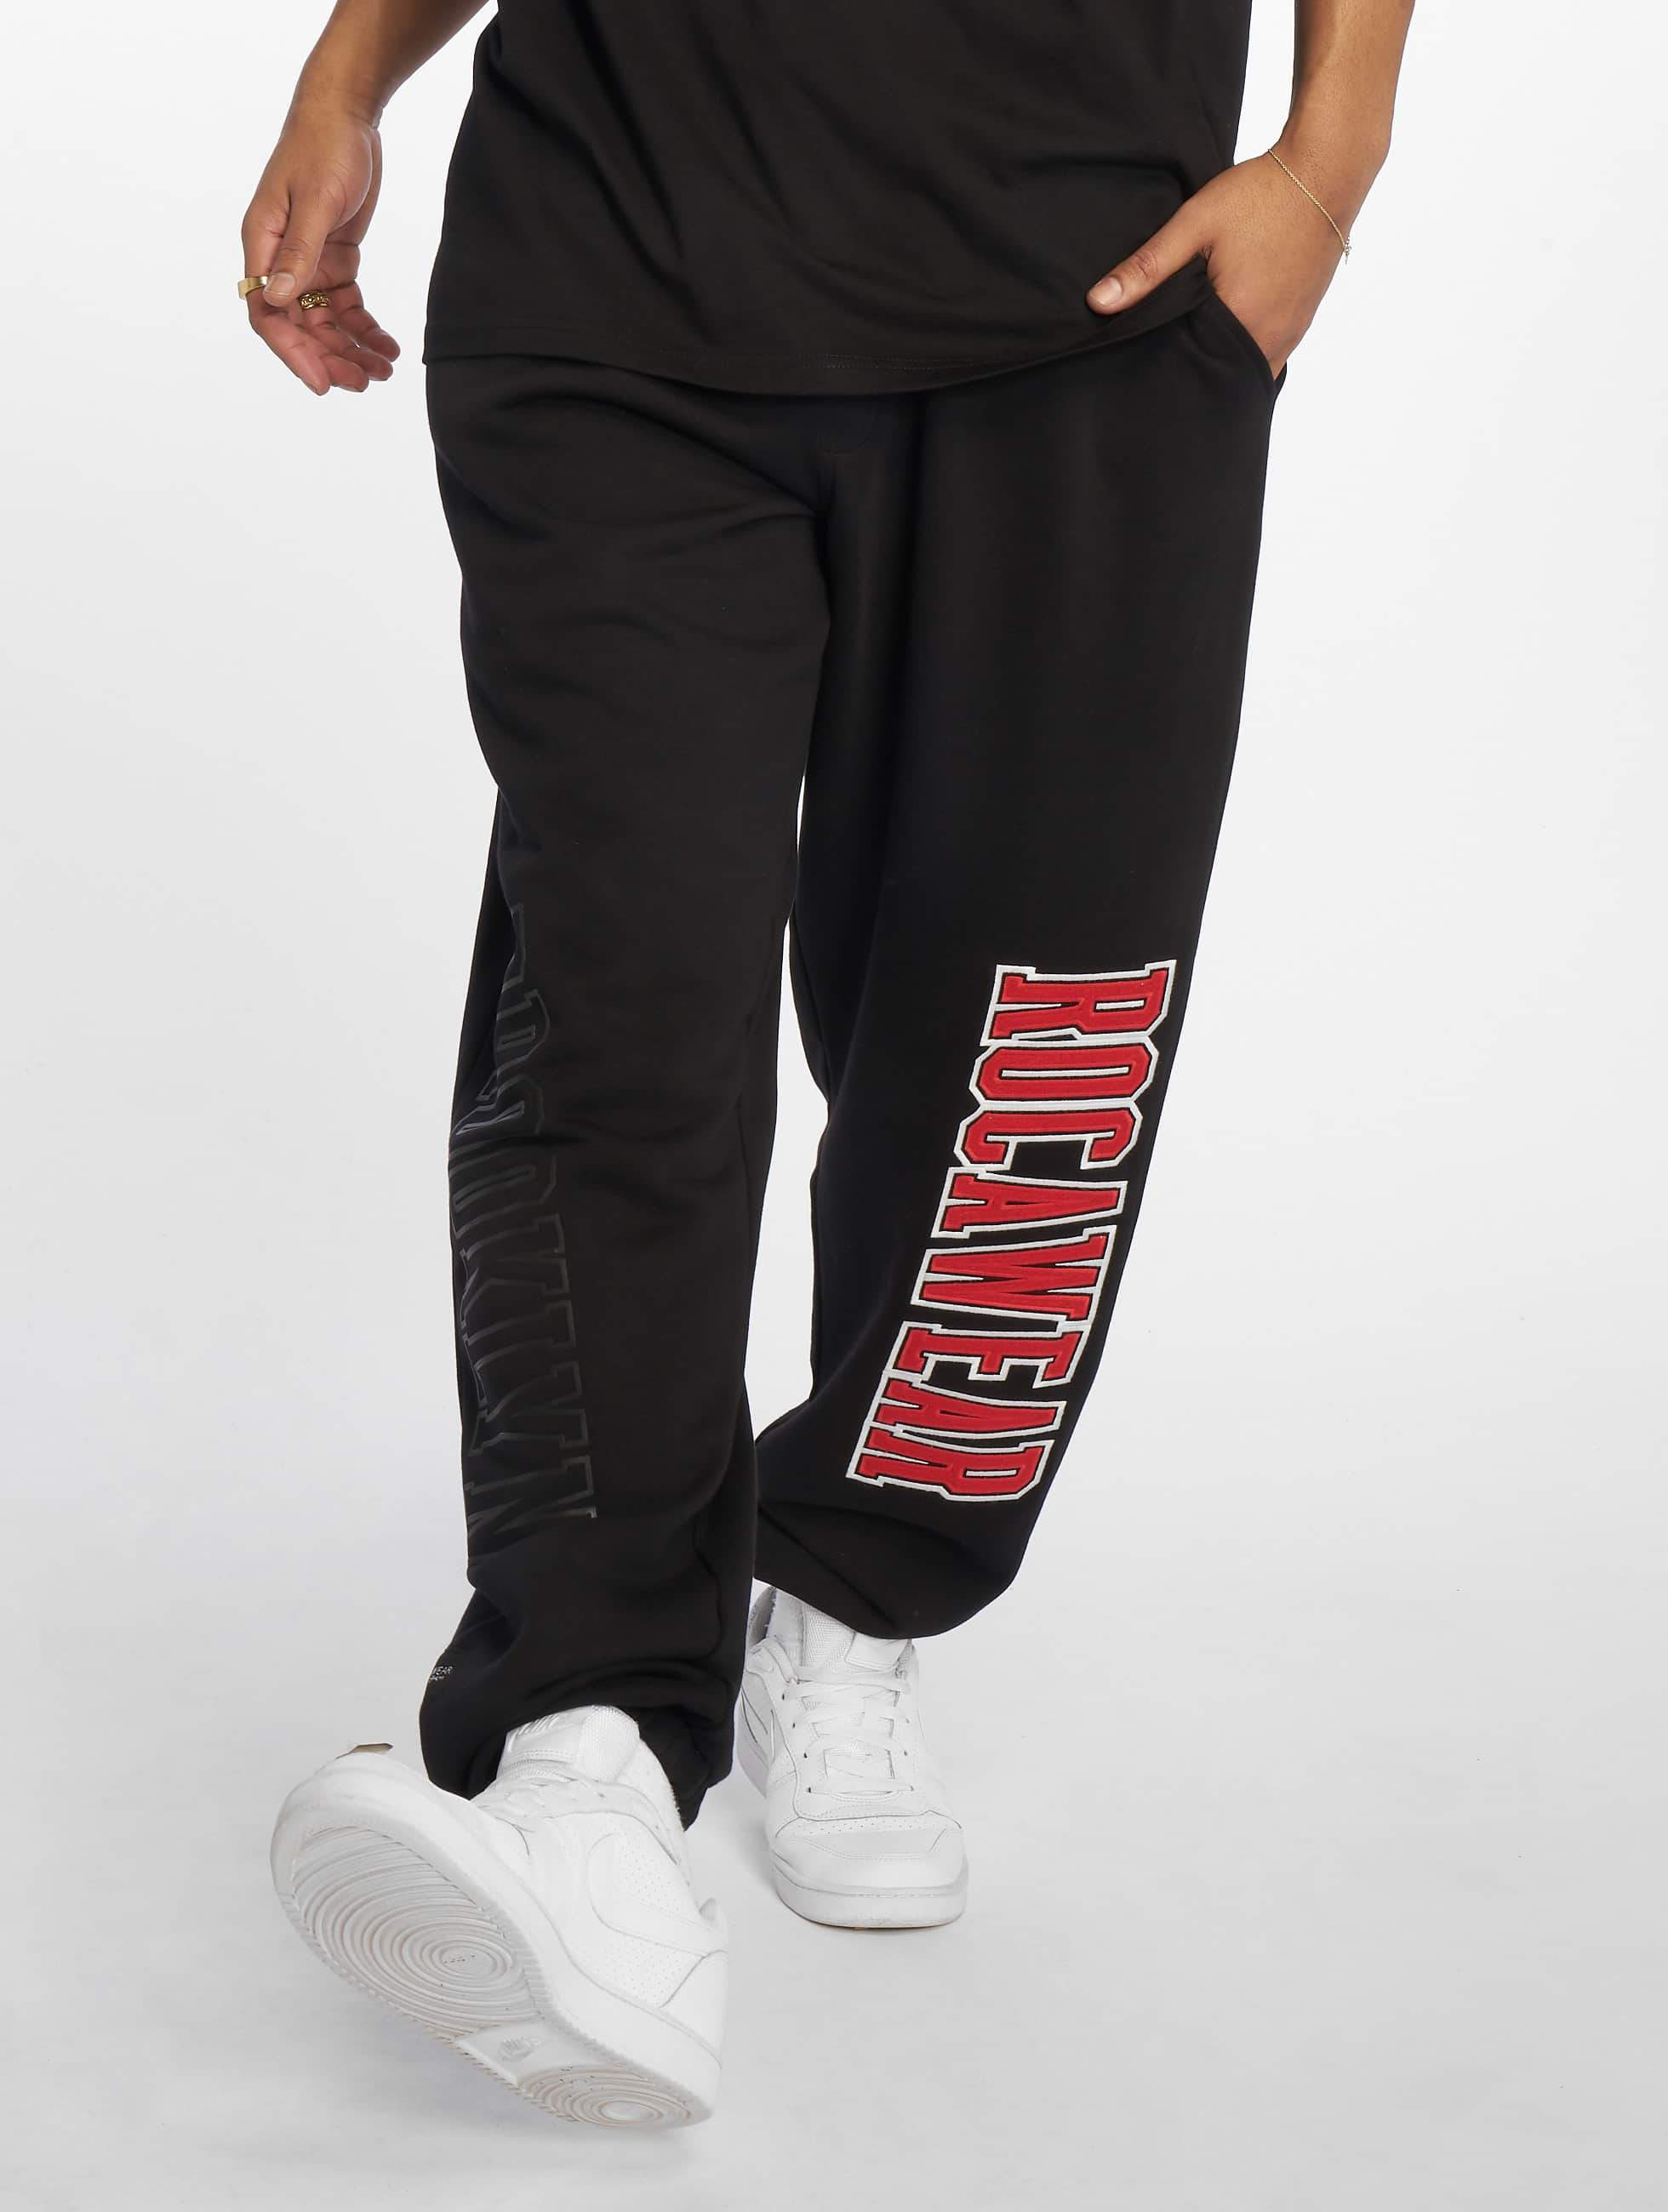 Rocawear / Sweat Pant Brooklyn in black XL